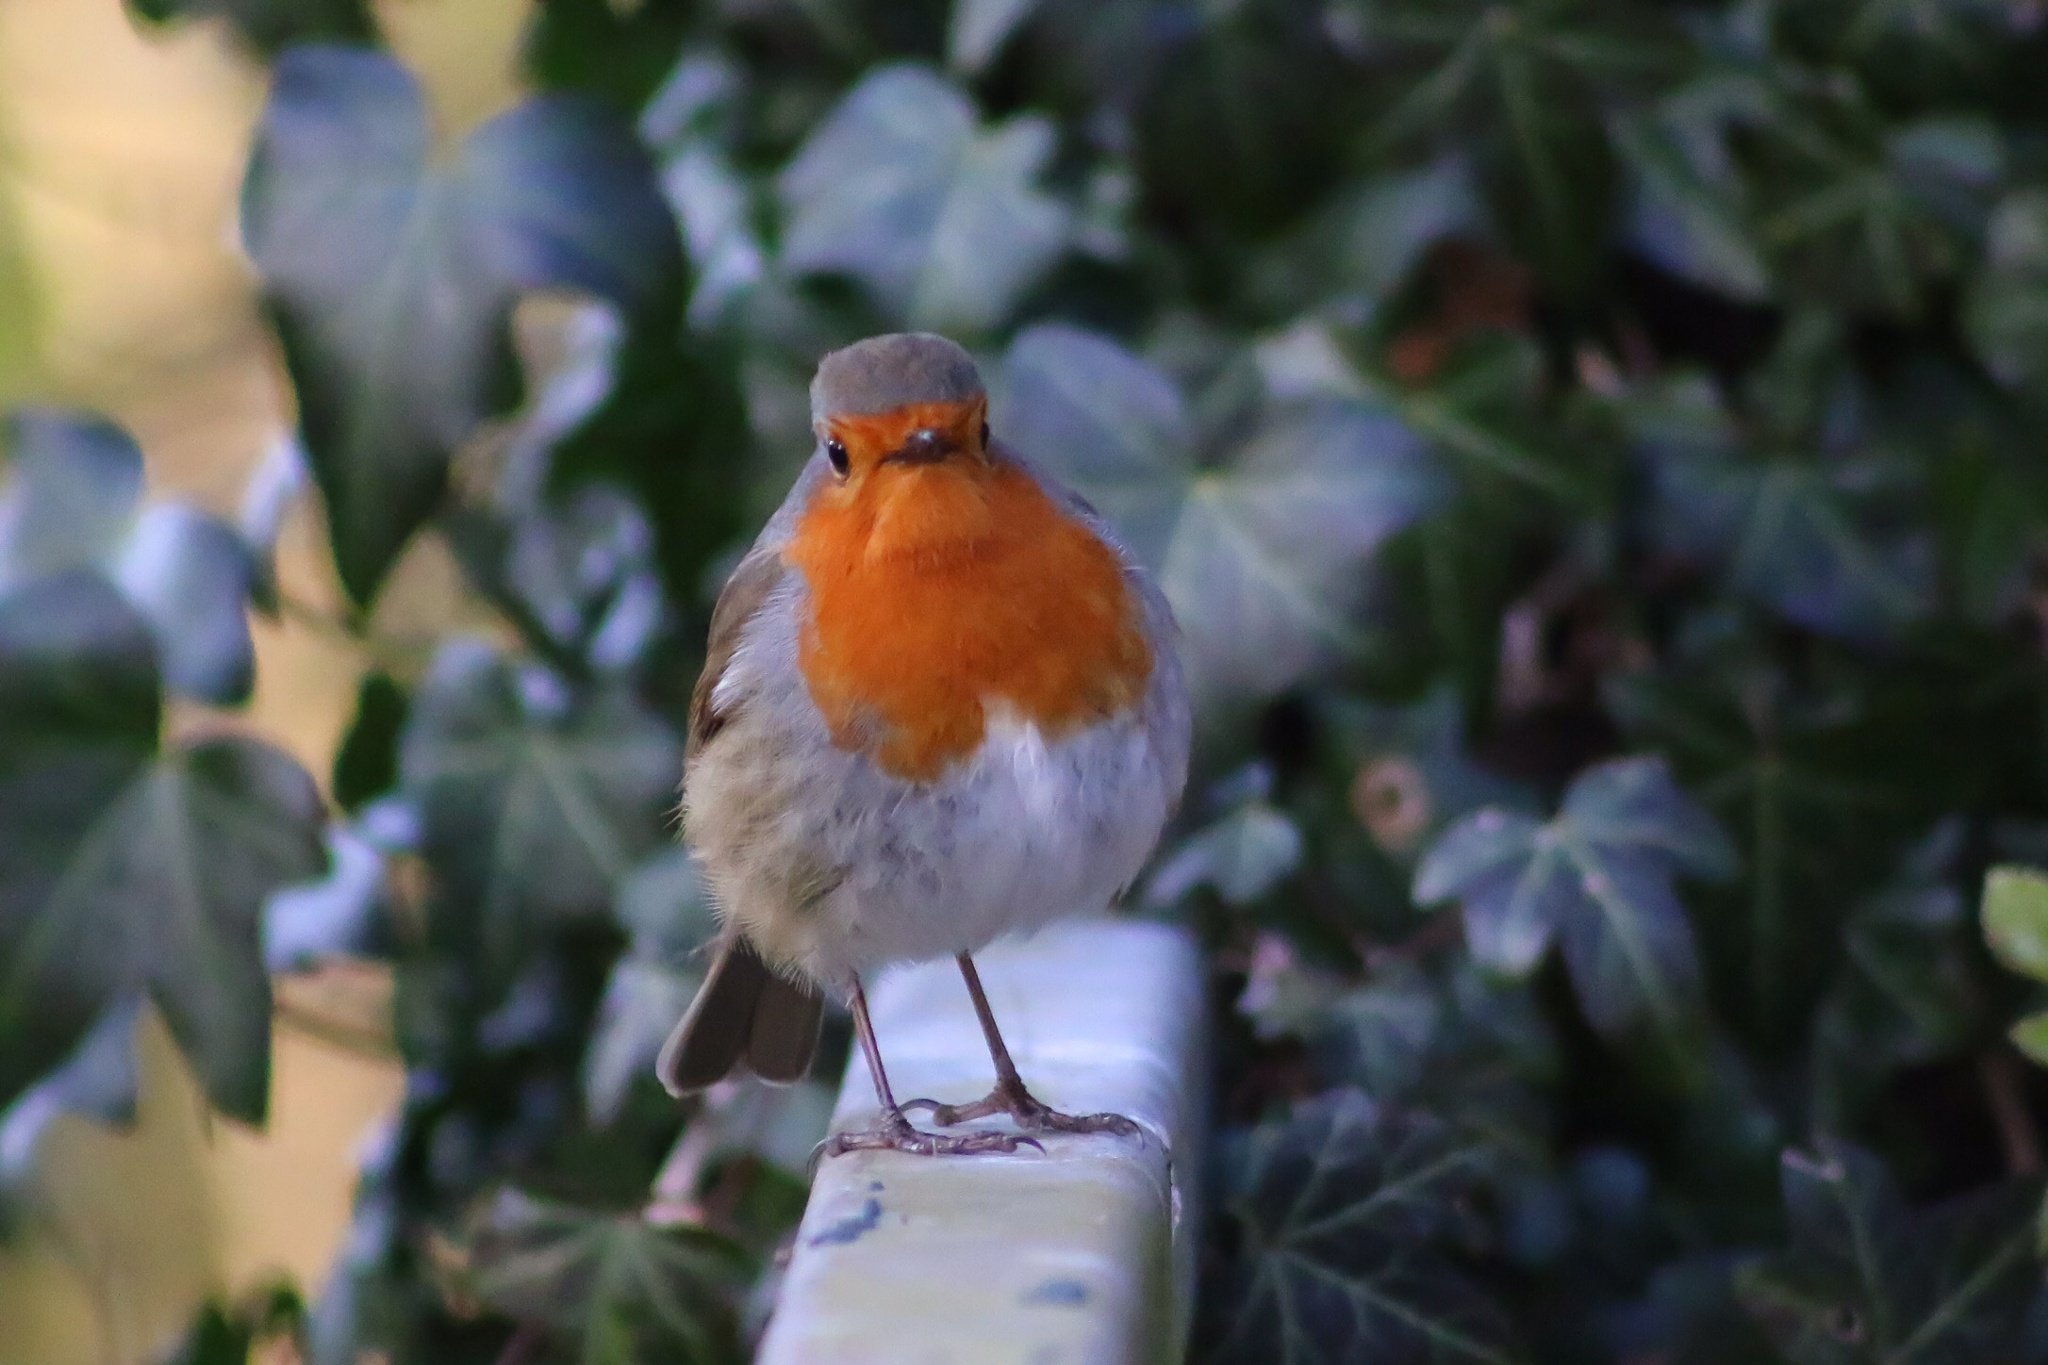 Friendly Robin by Kim Shorter